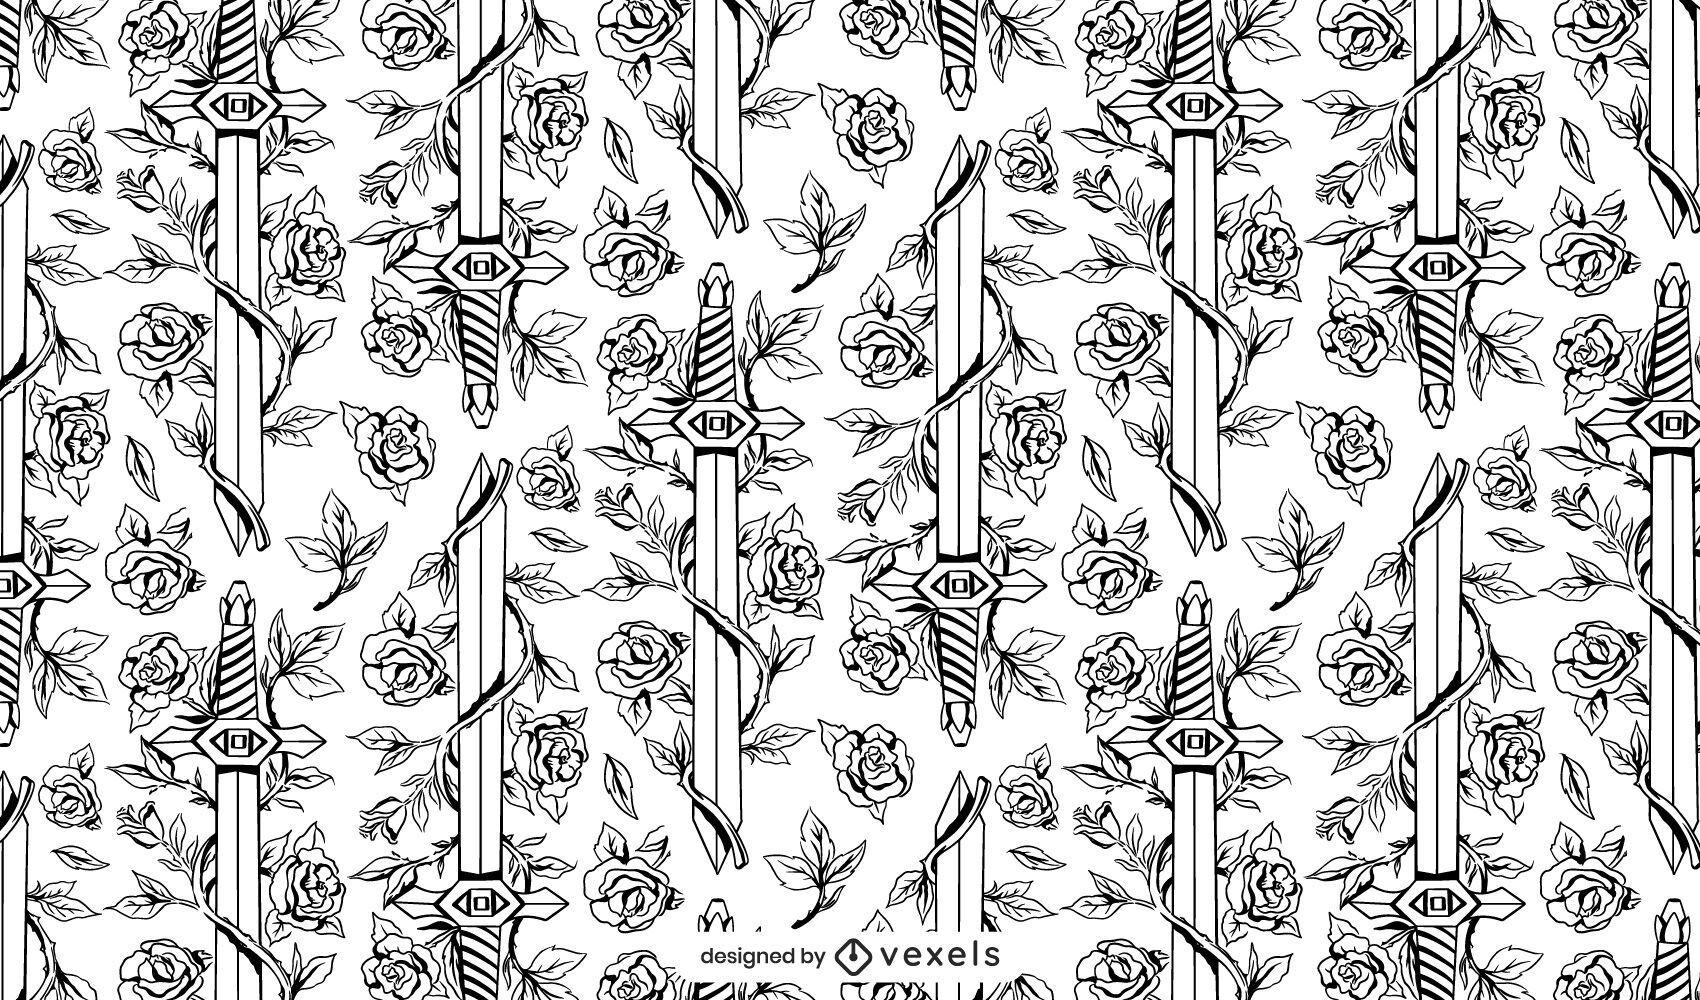 Espada arma rosas naturaleza patrón diseño